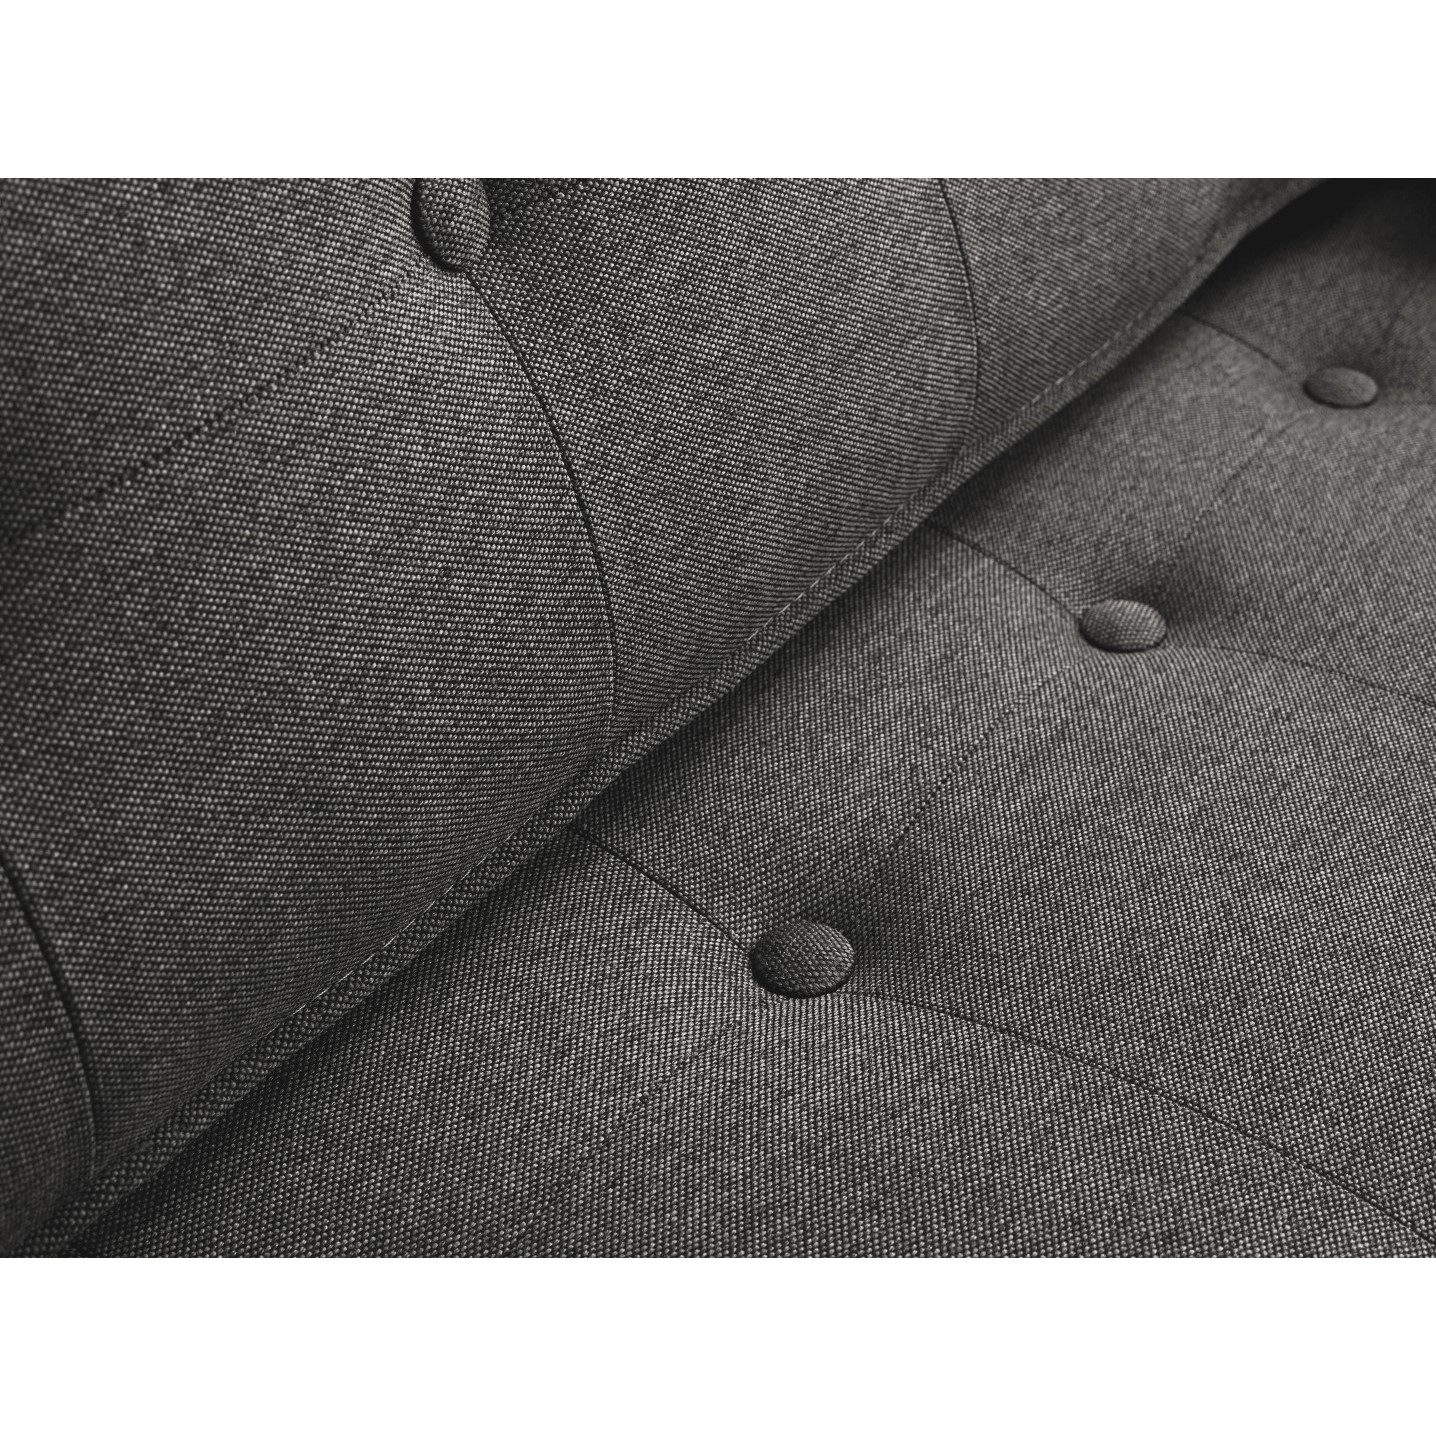 3 Seater Sofa Topic Wood   Steel